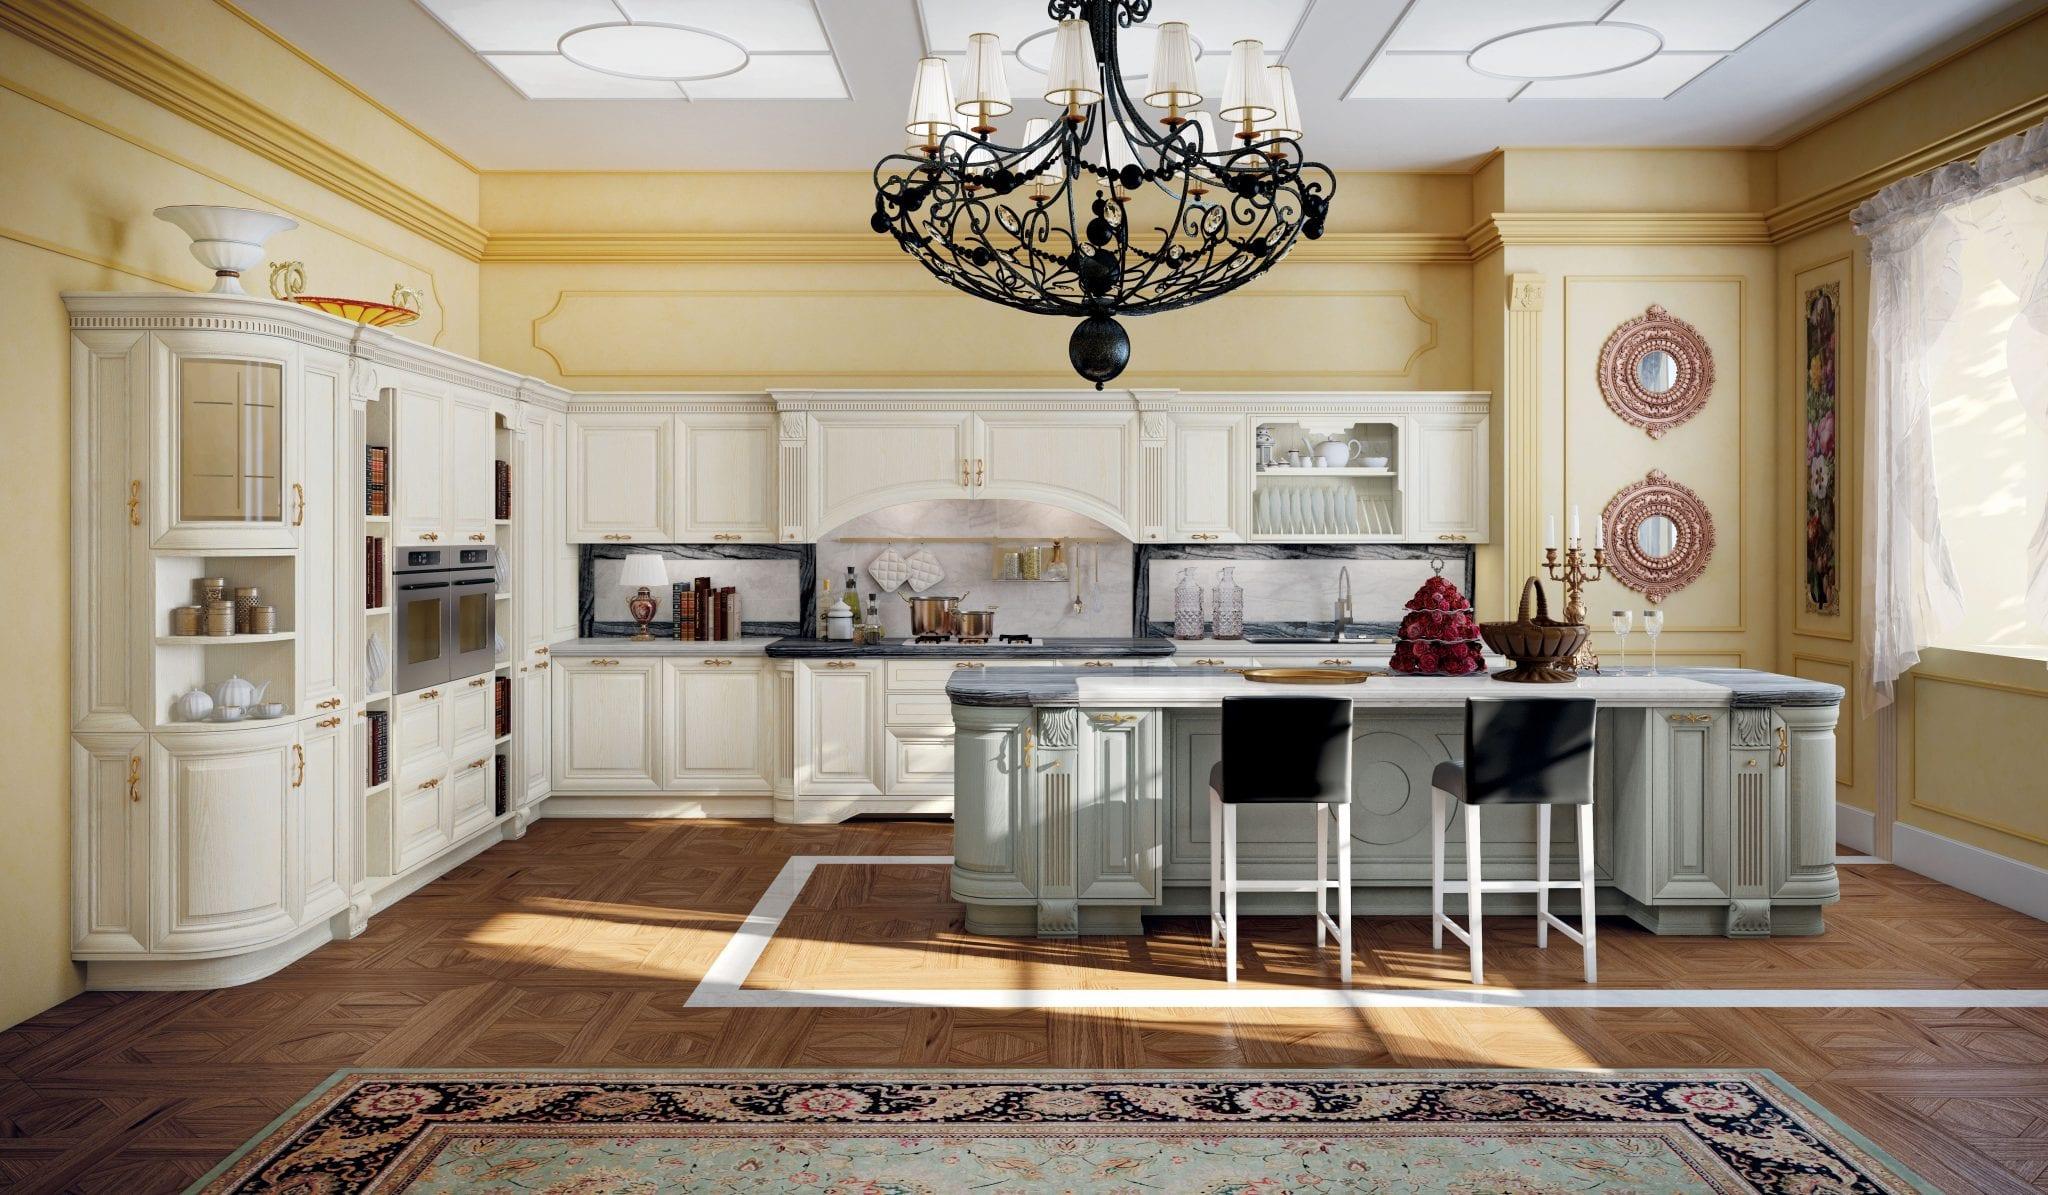 Cucina elegant raimondi idee casa - Tipologie di cucine ...